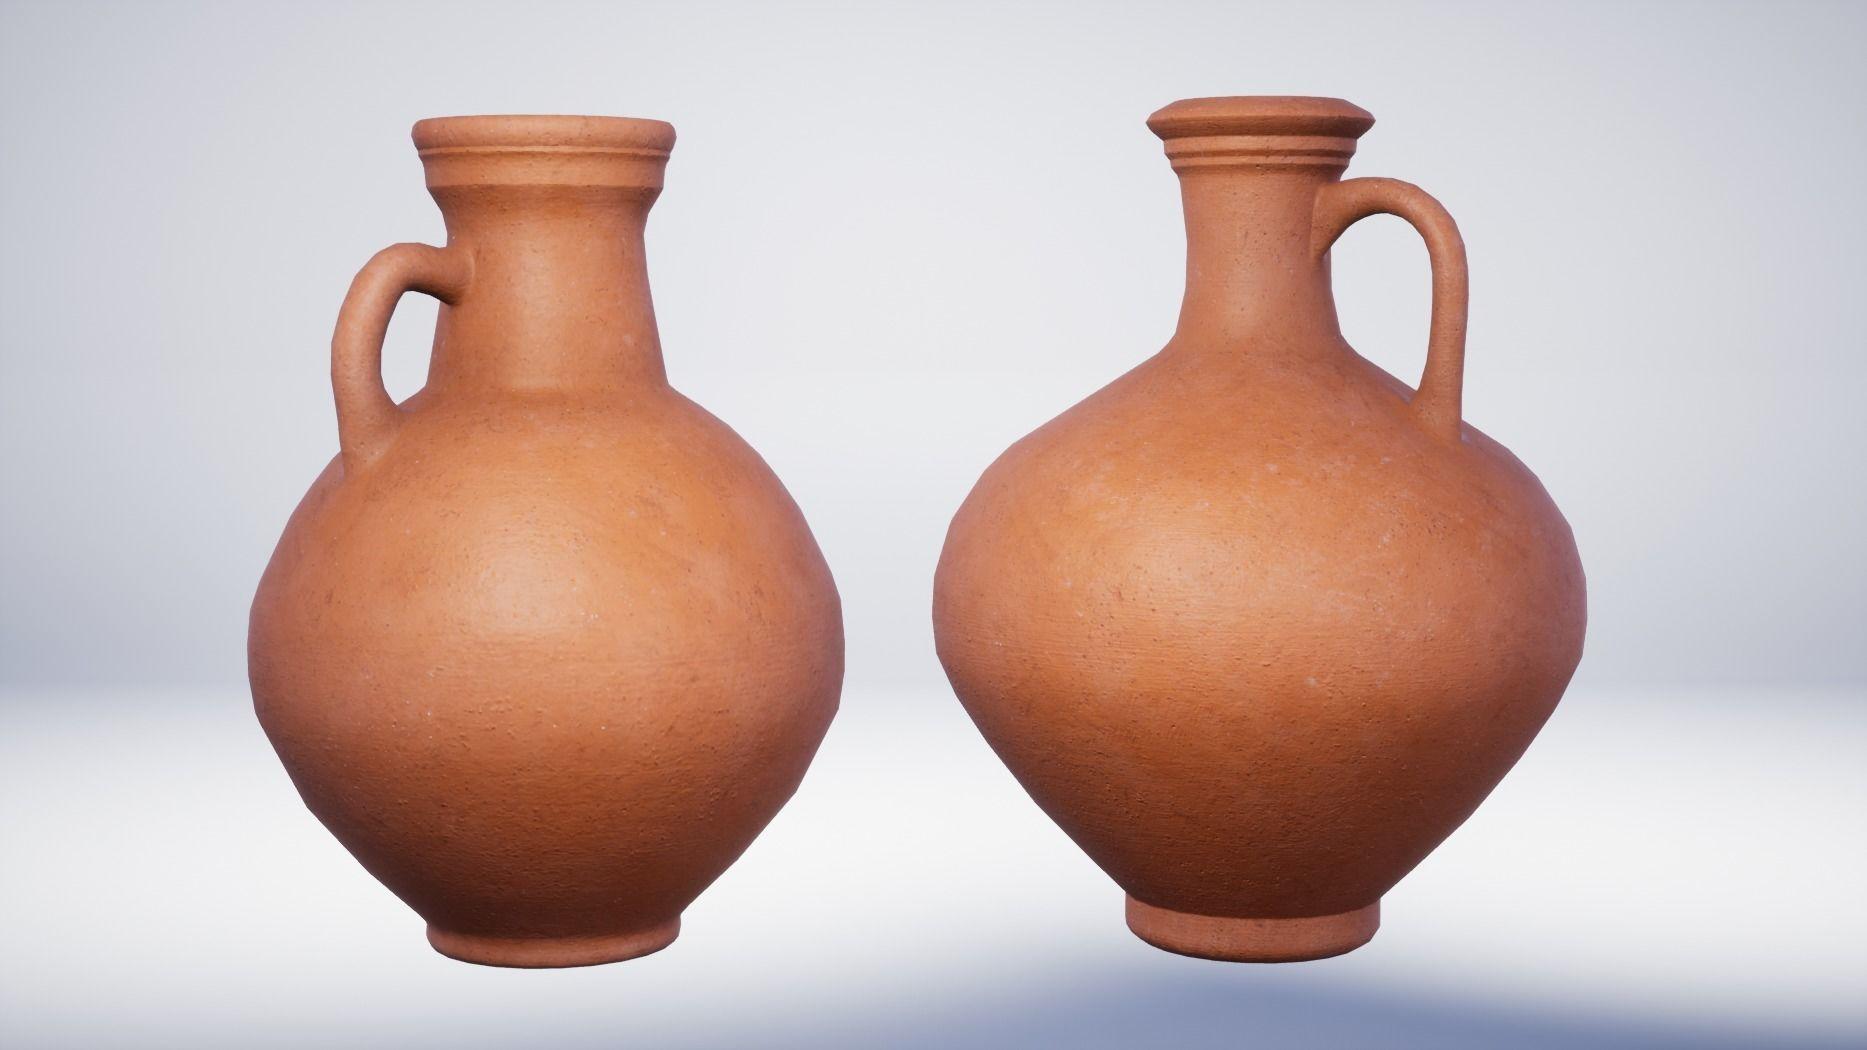 Roman Terracotta Flagons - 2 Variations